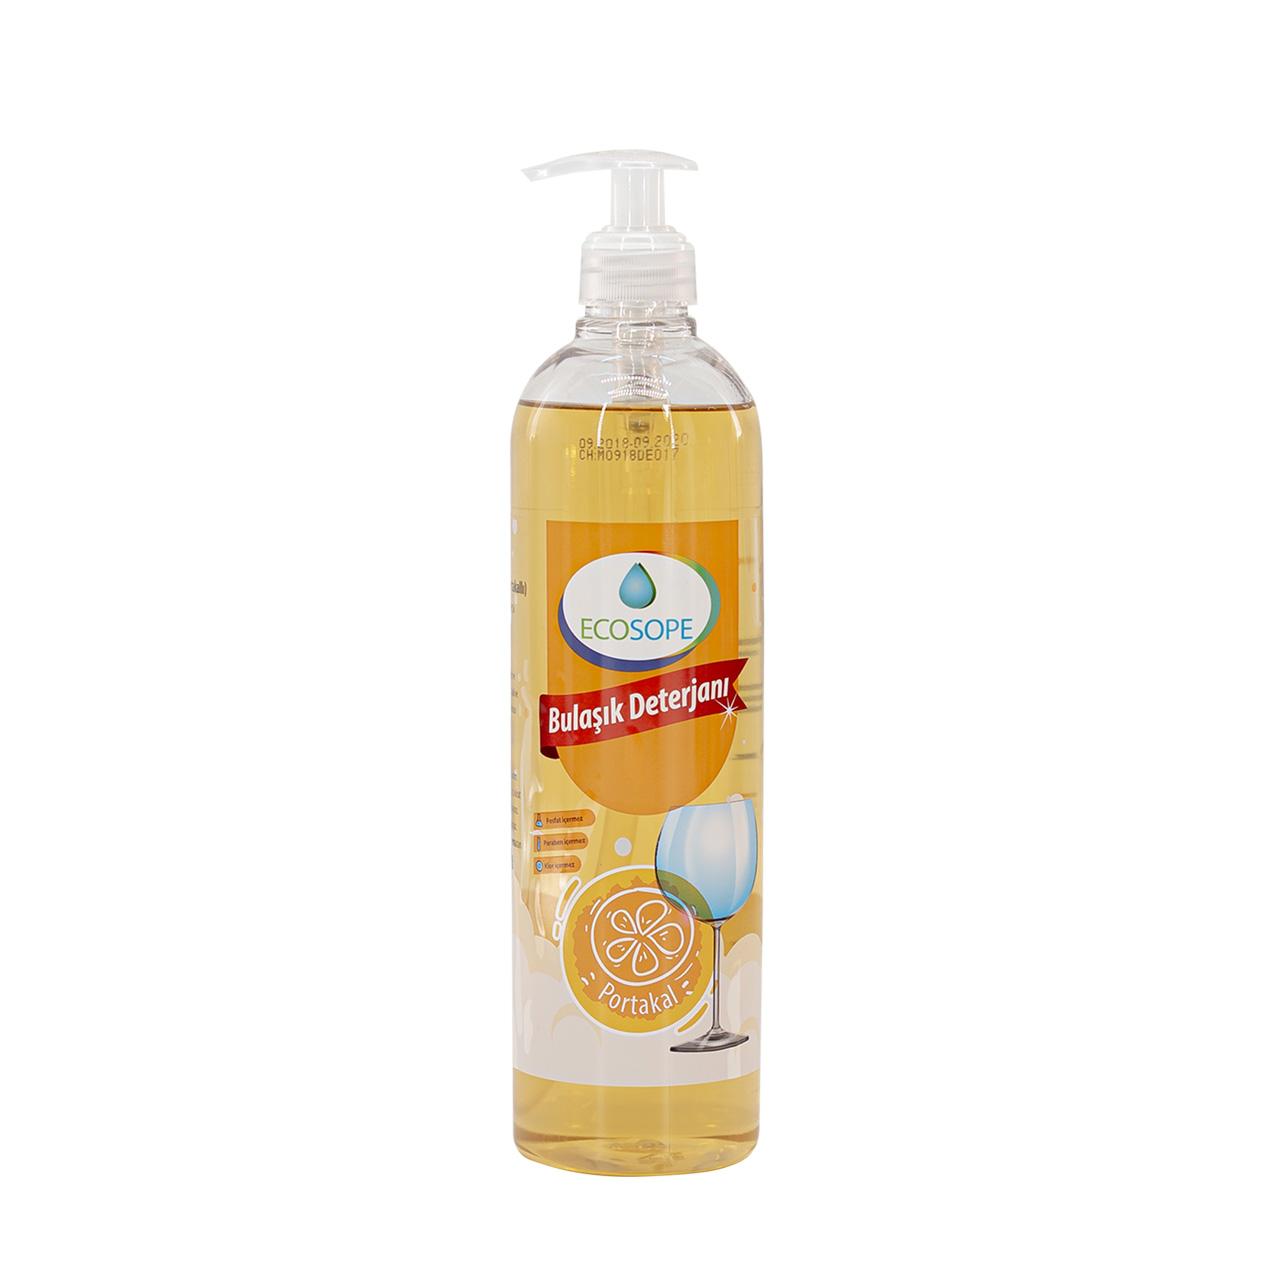 Ecosope Liquid handwashing detergent orange